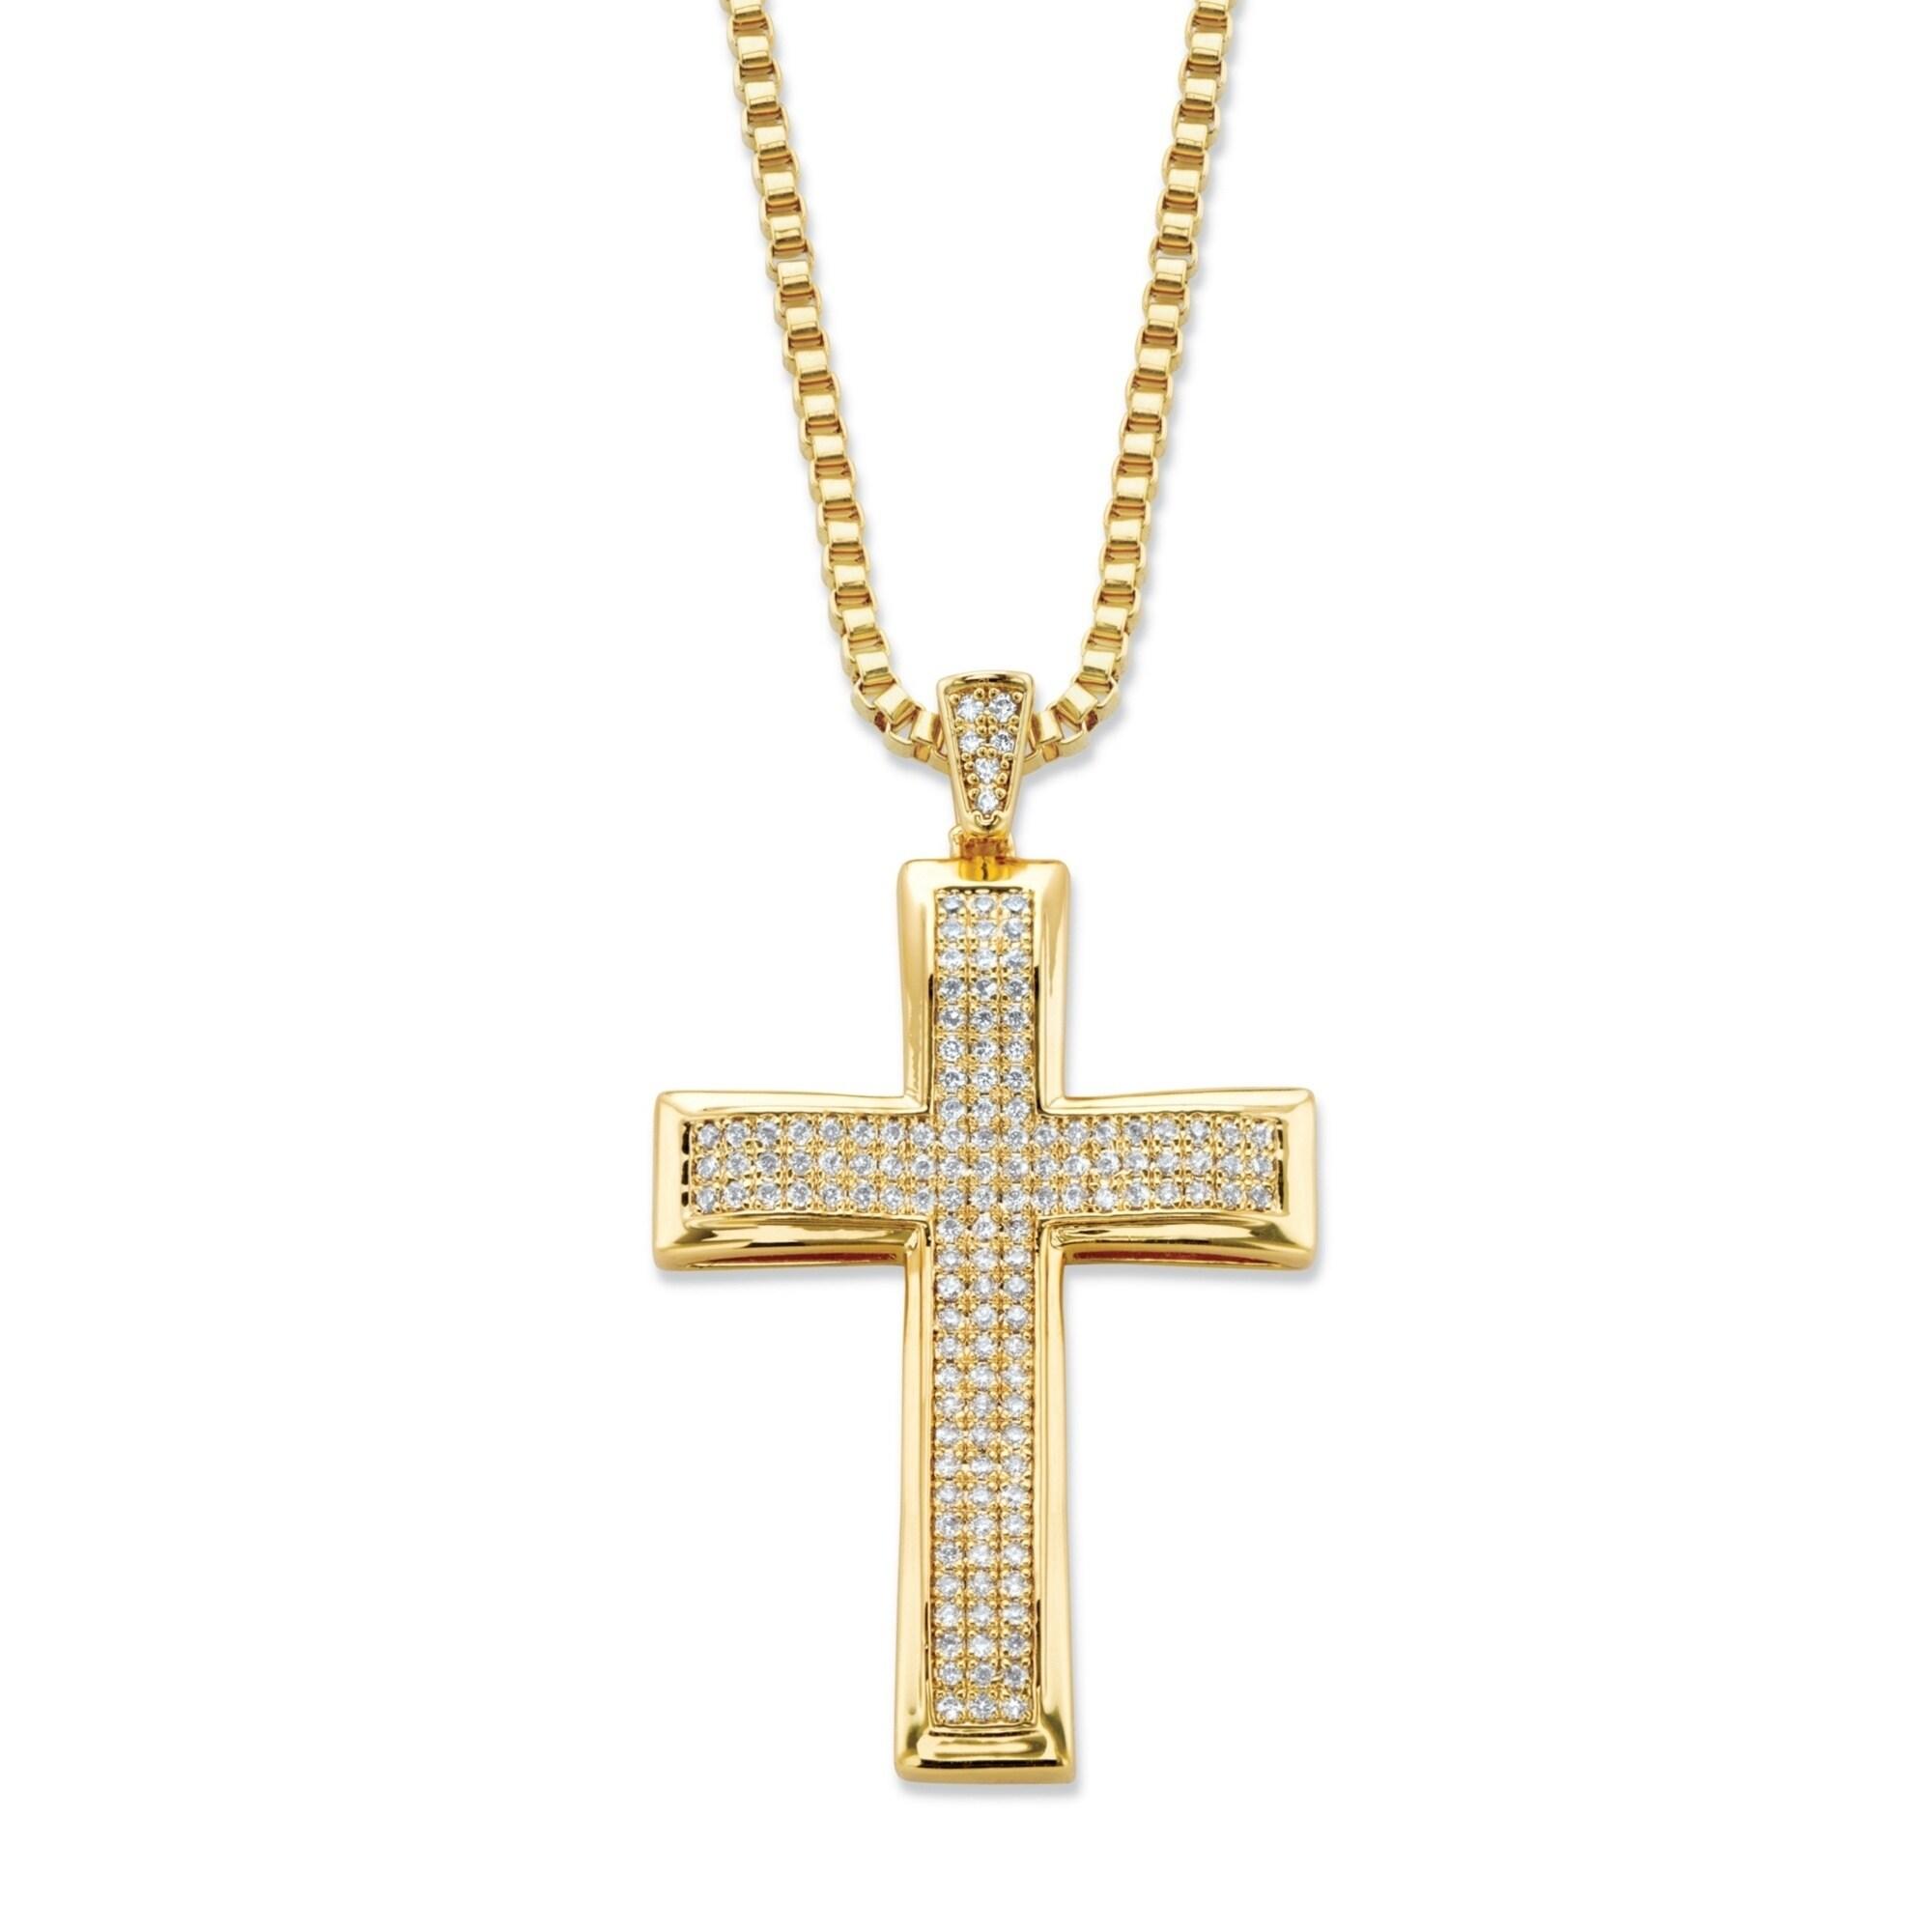 Shop Men S Yellow Gold Plated Cross Pendant 25mm Round Cubic Zirconia Overstock 22702127